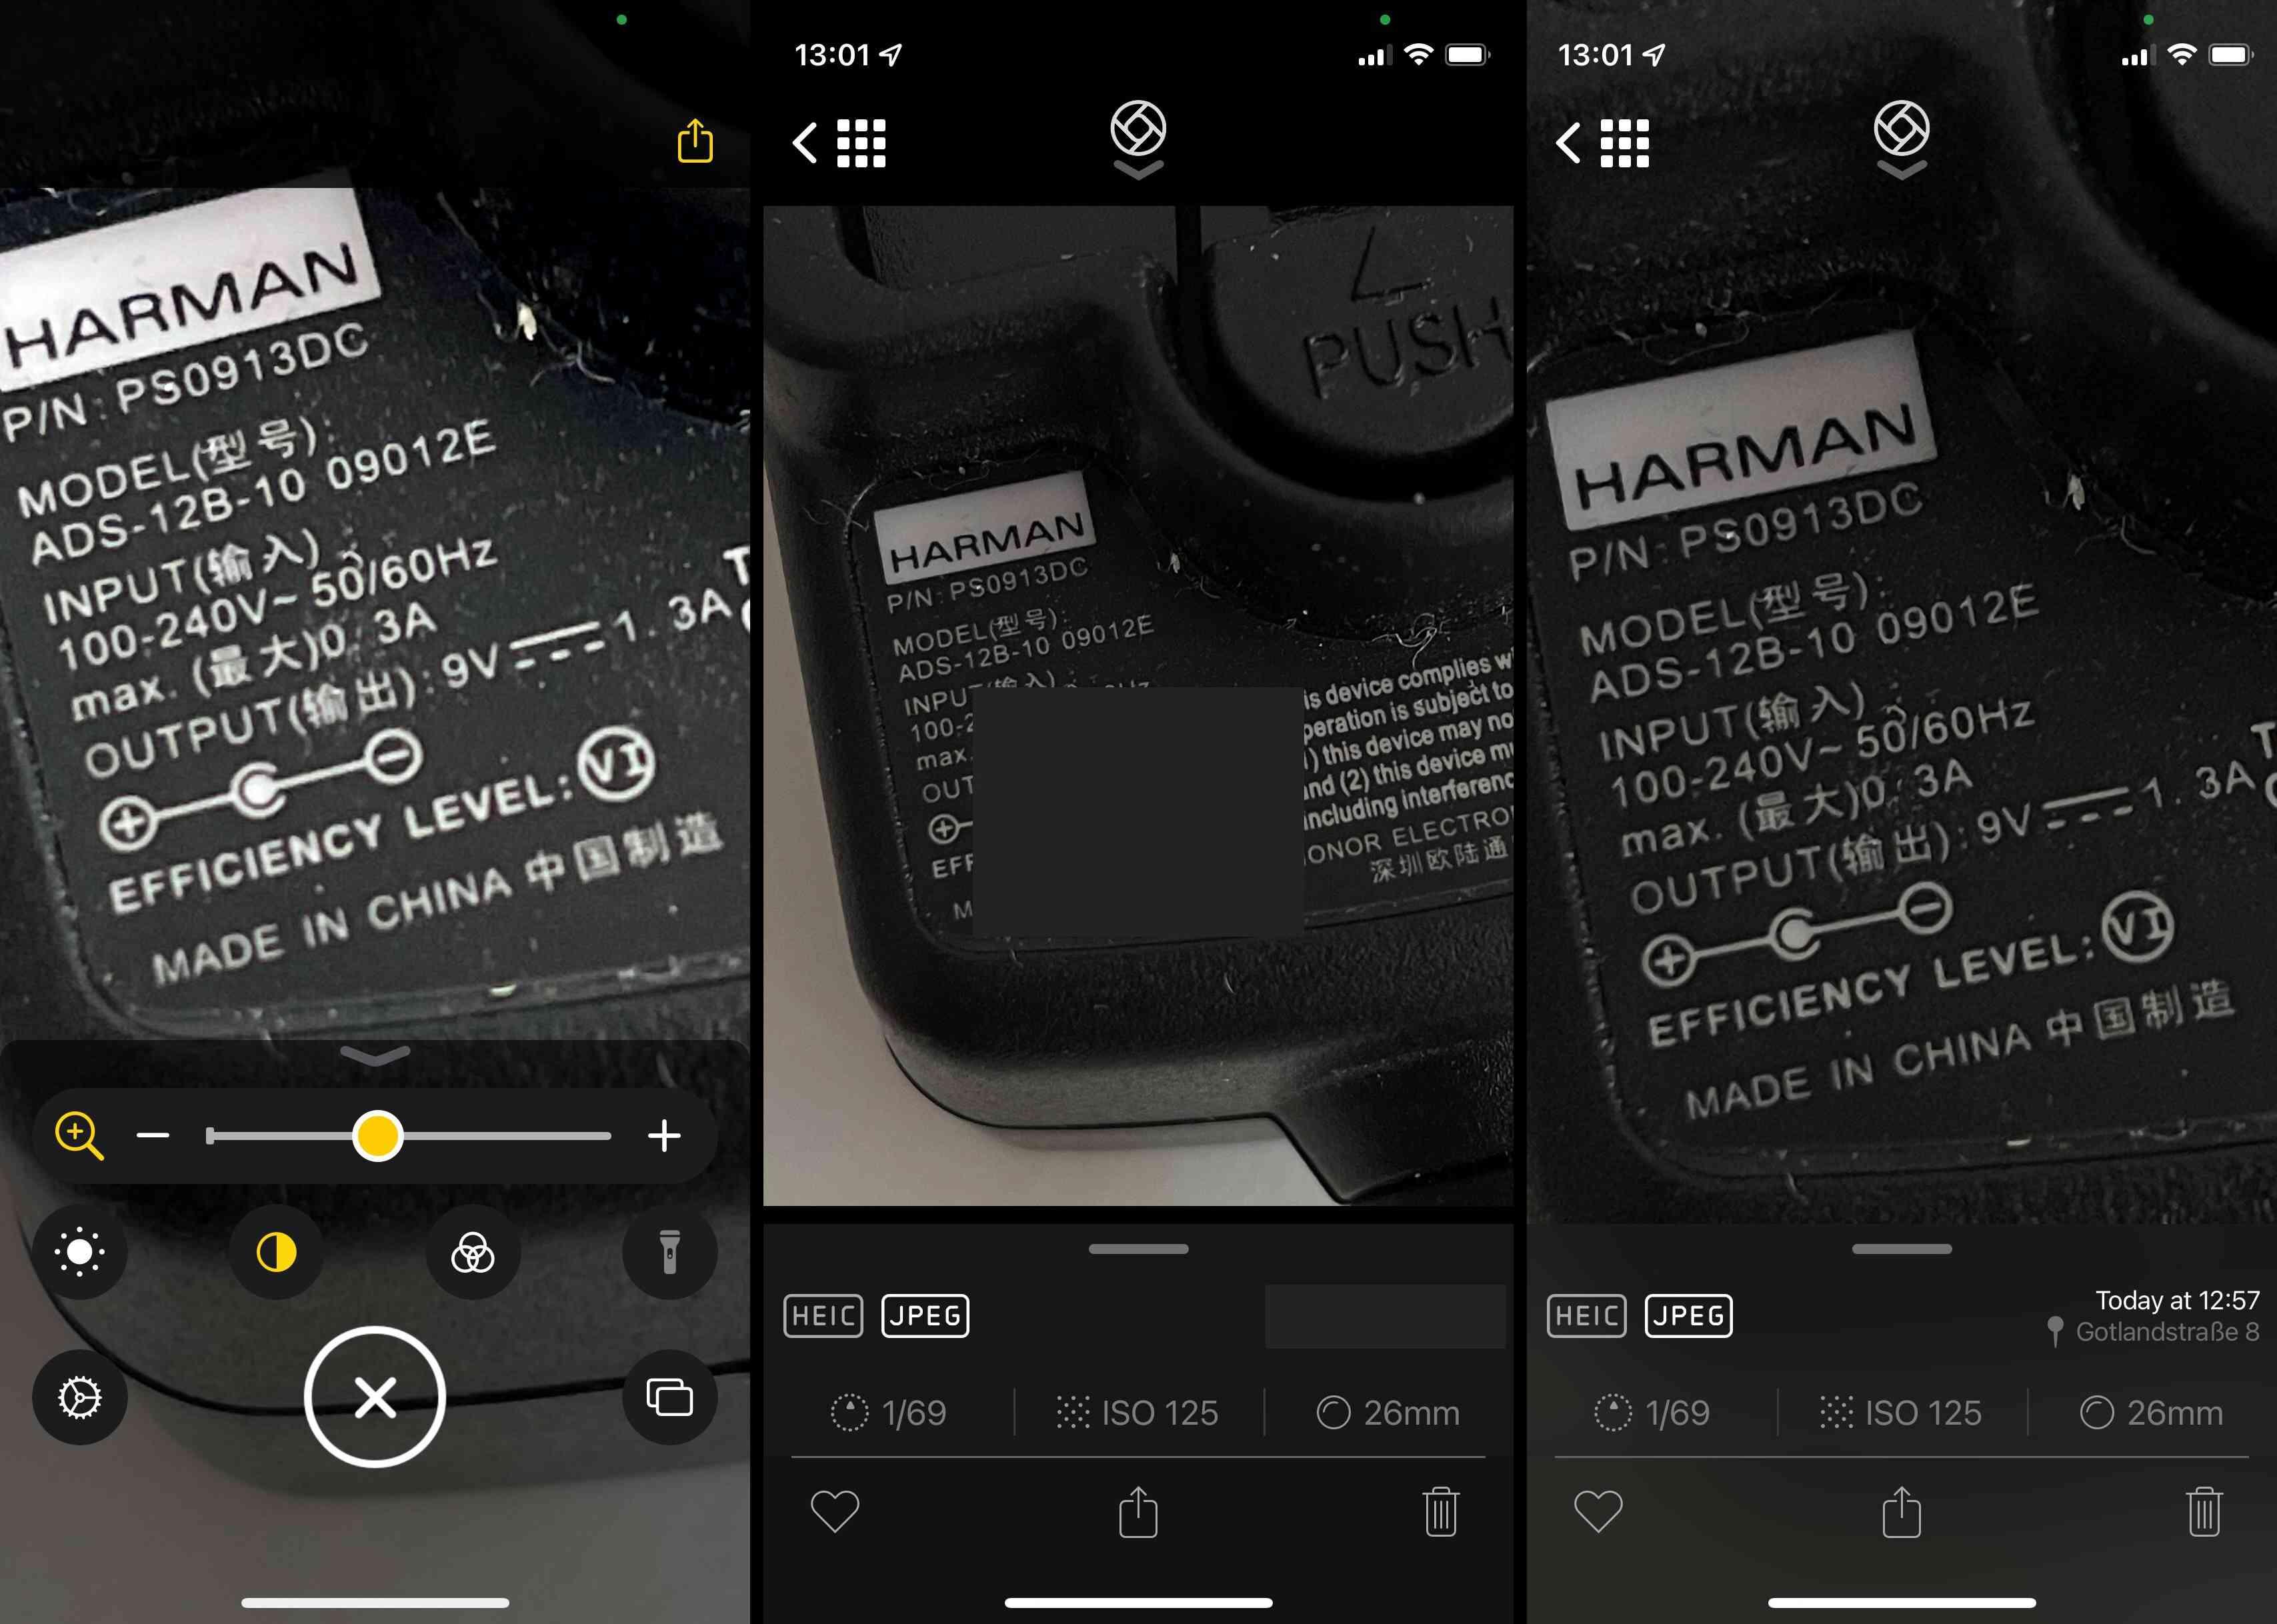 iPhone 13 Pro magnifier vs Halide camera zoom